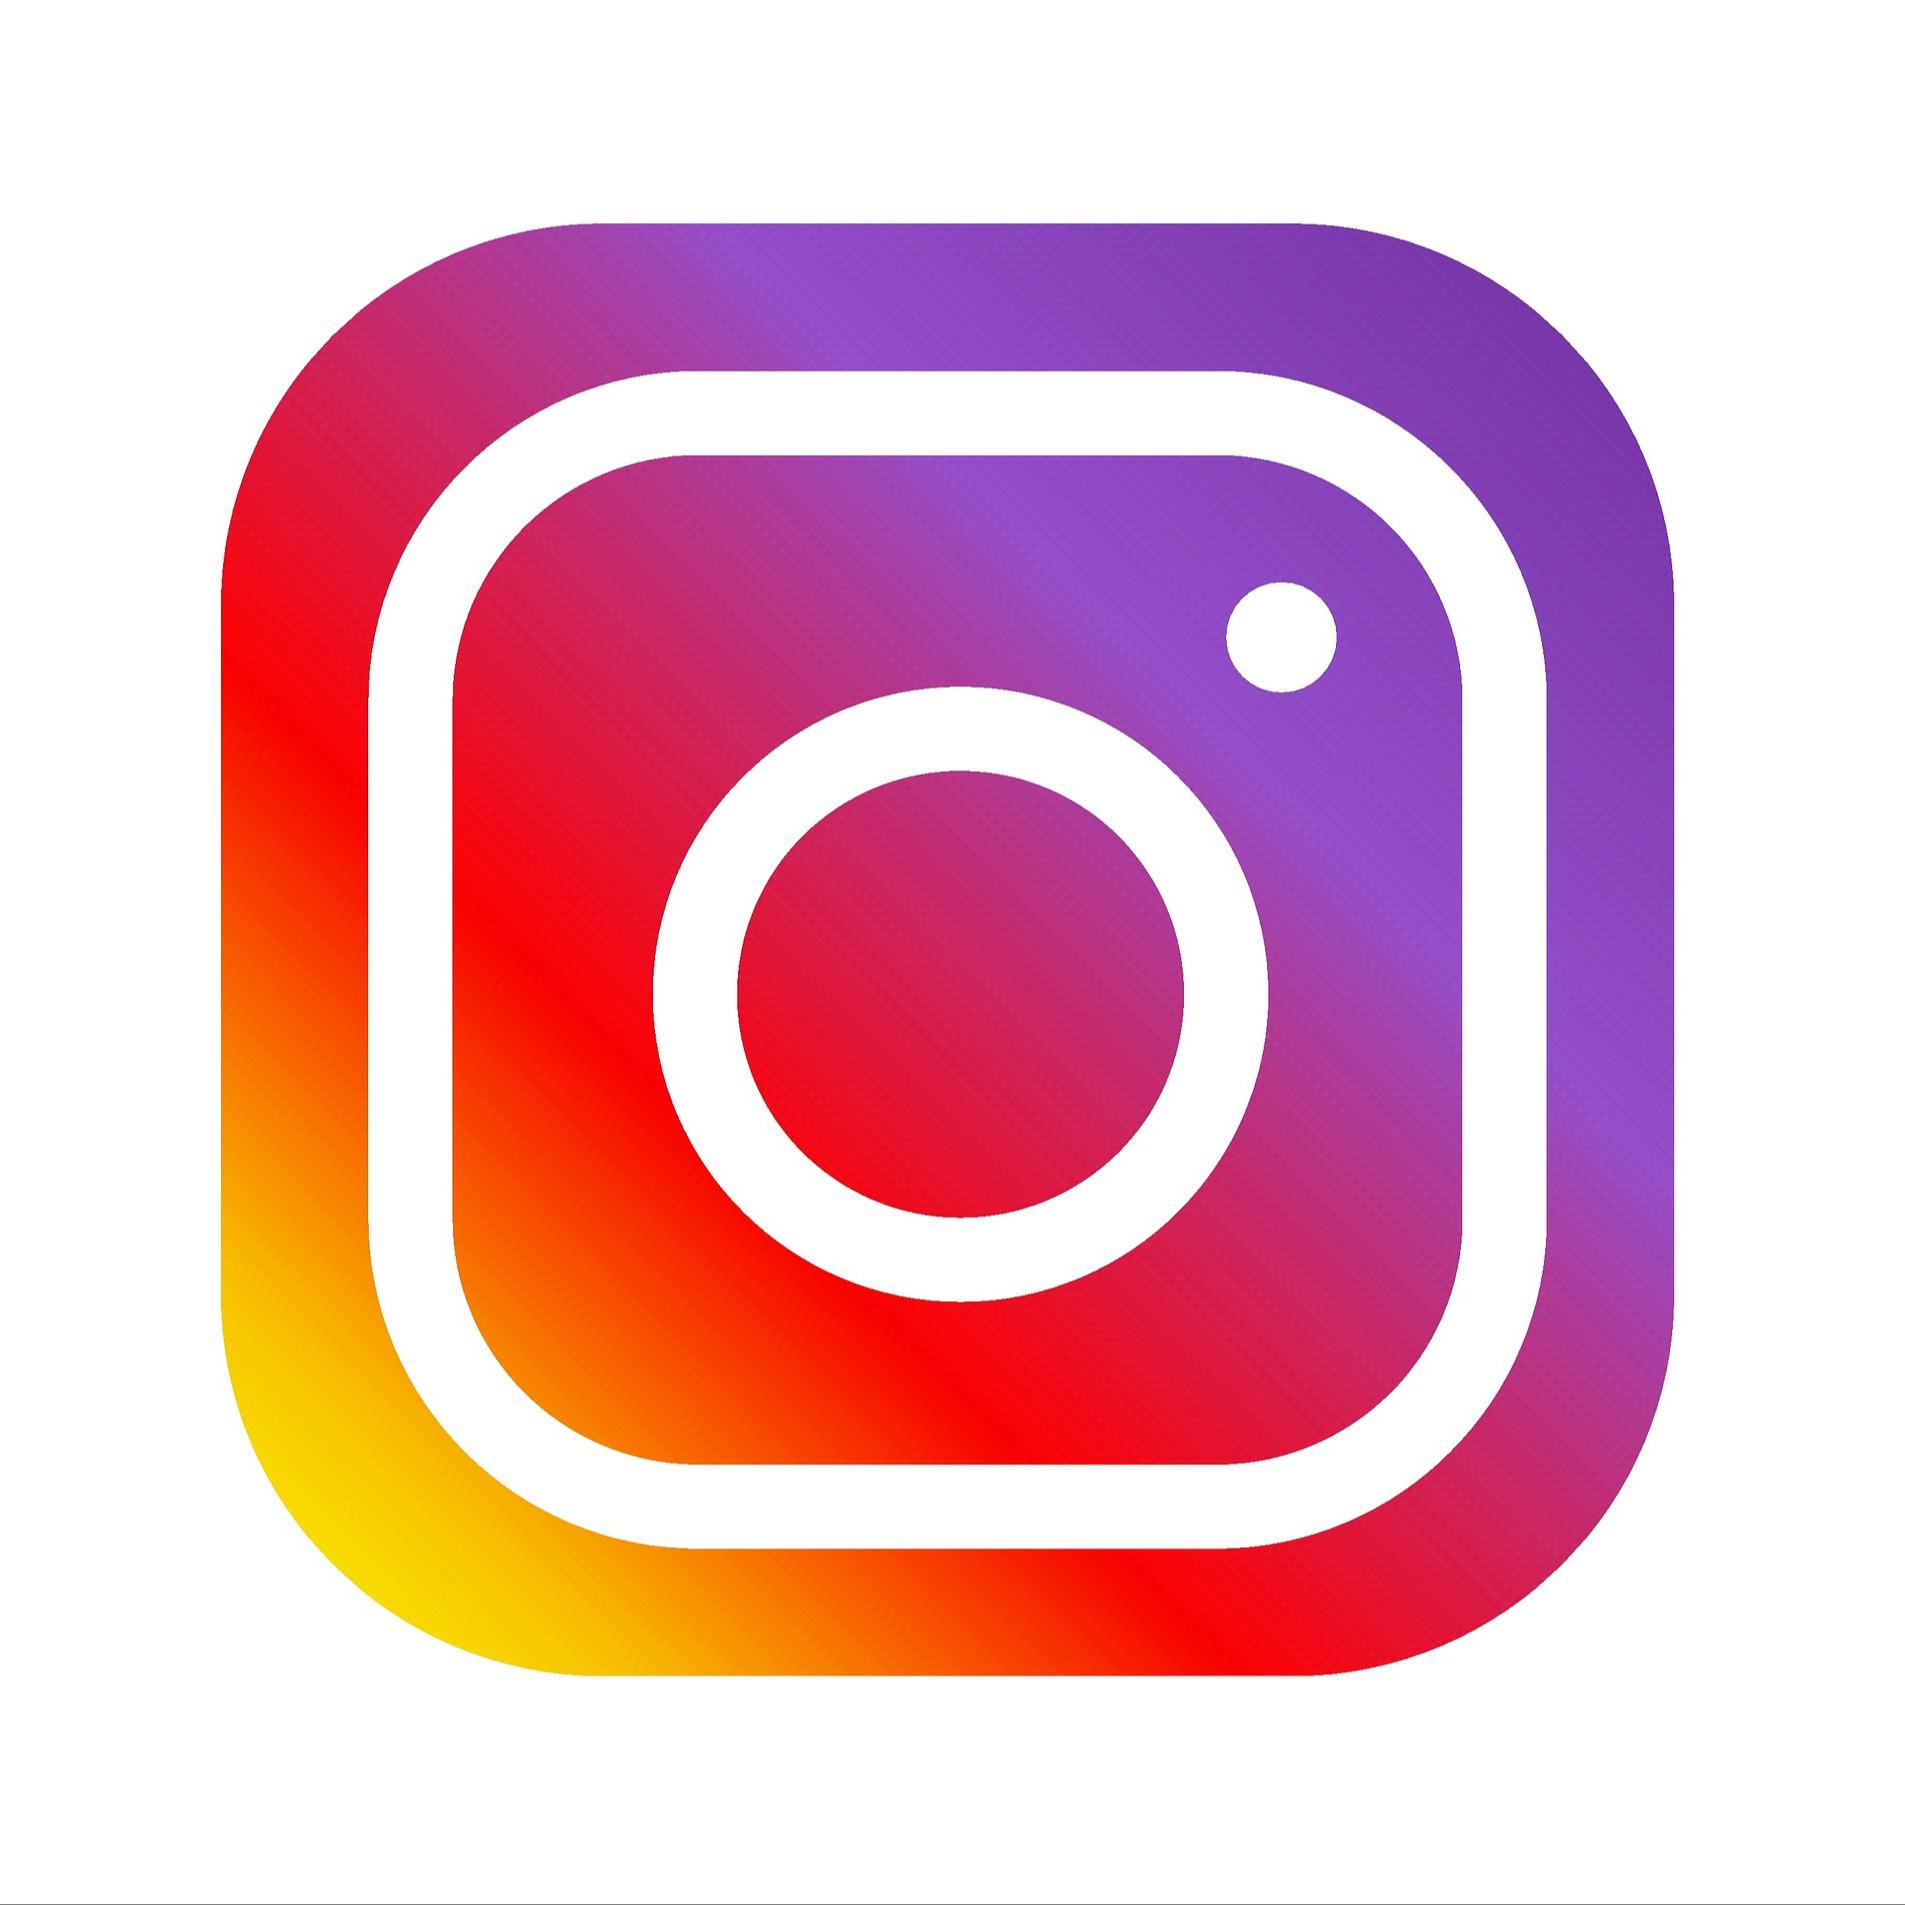 @PaNGeoPassau Instagram Link Thumbnail | Linktree